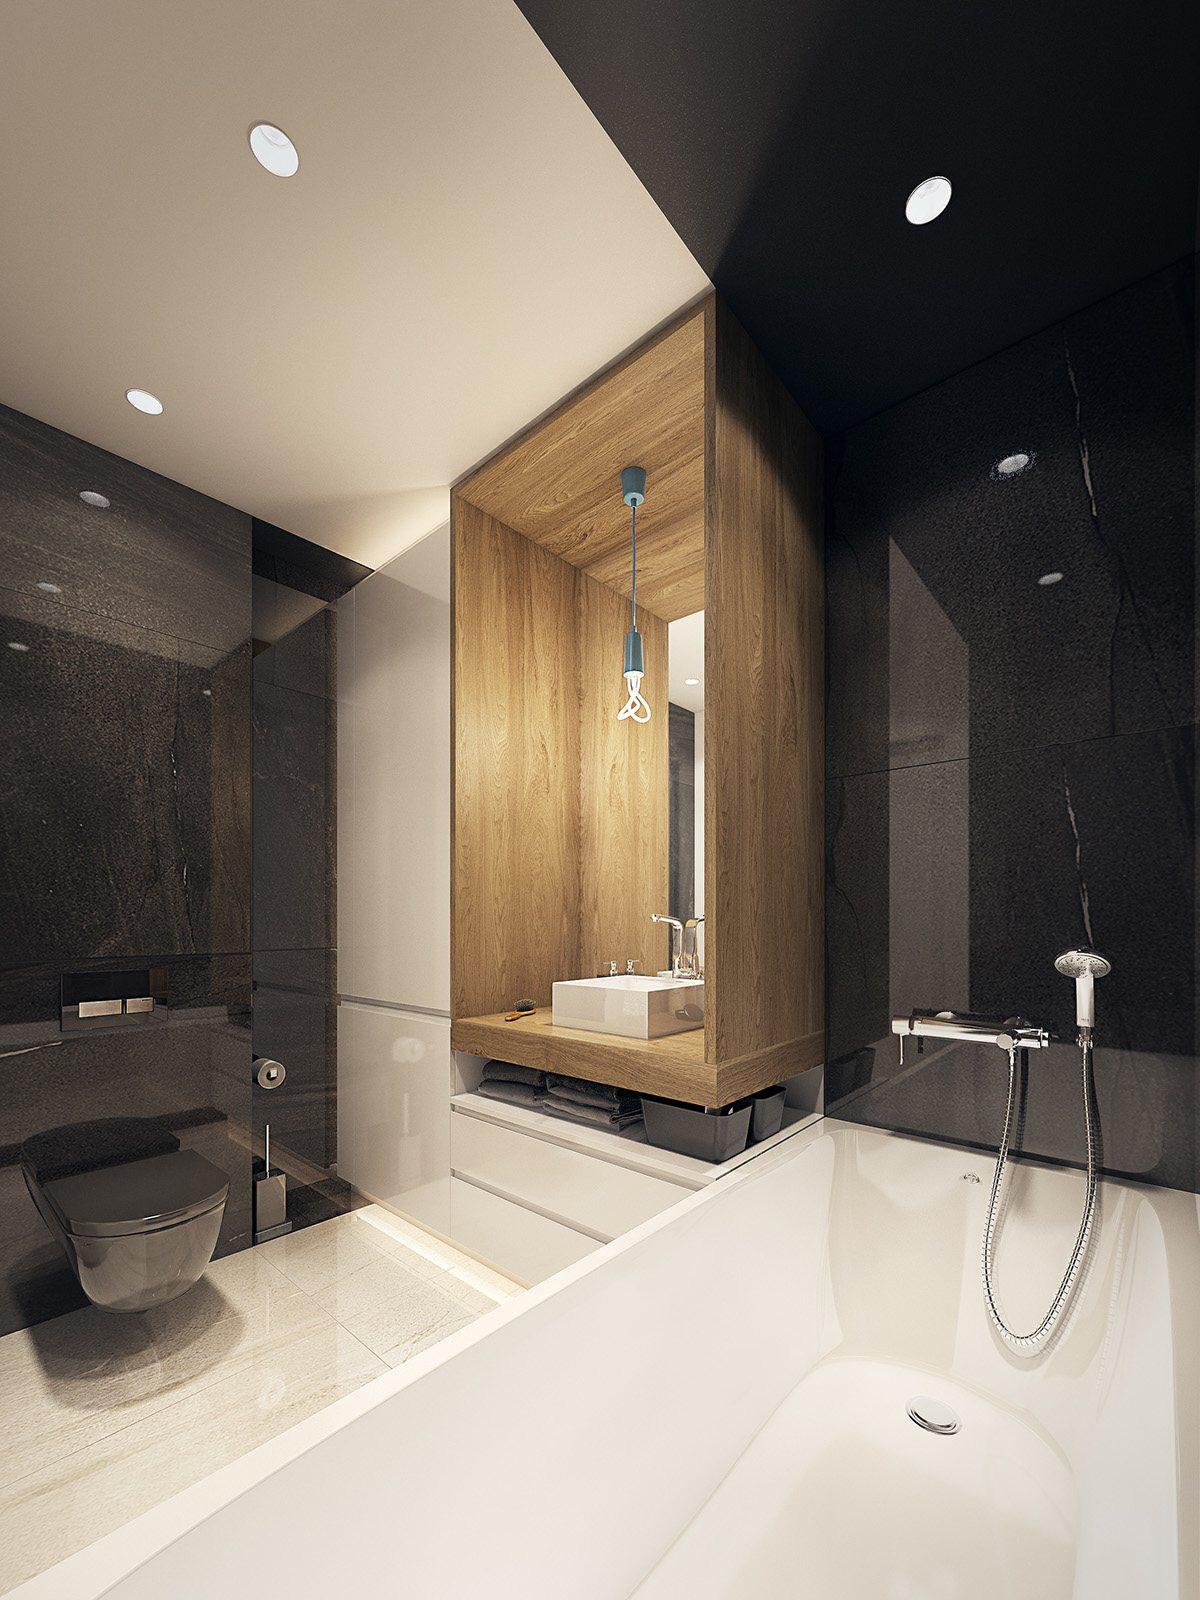 minimalist wooden bathroom design idea